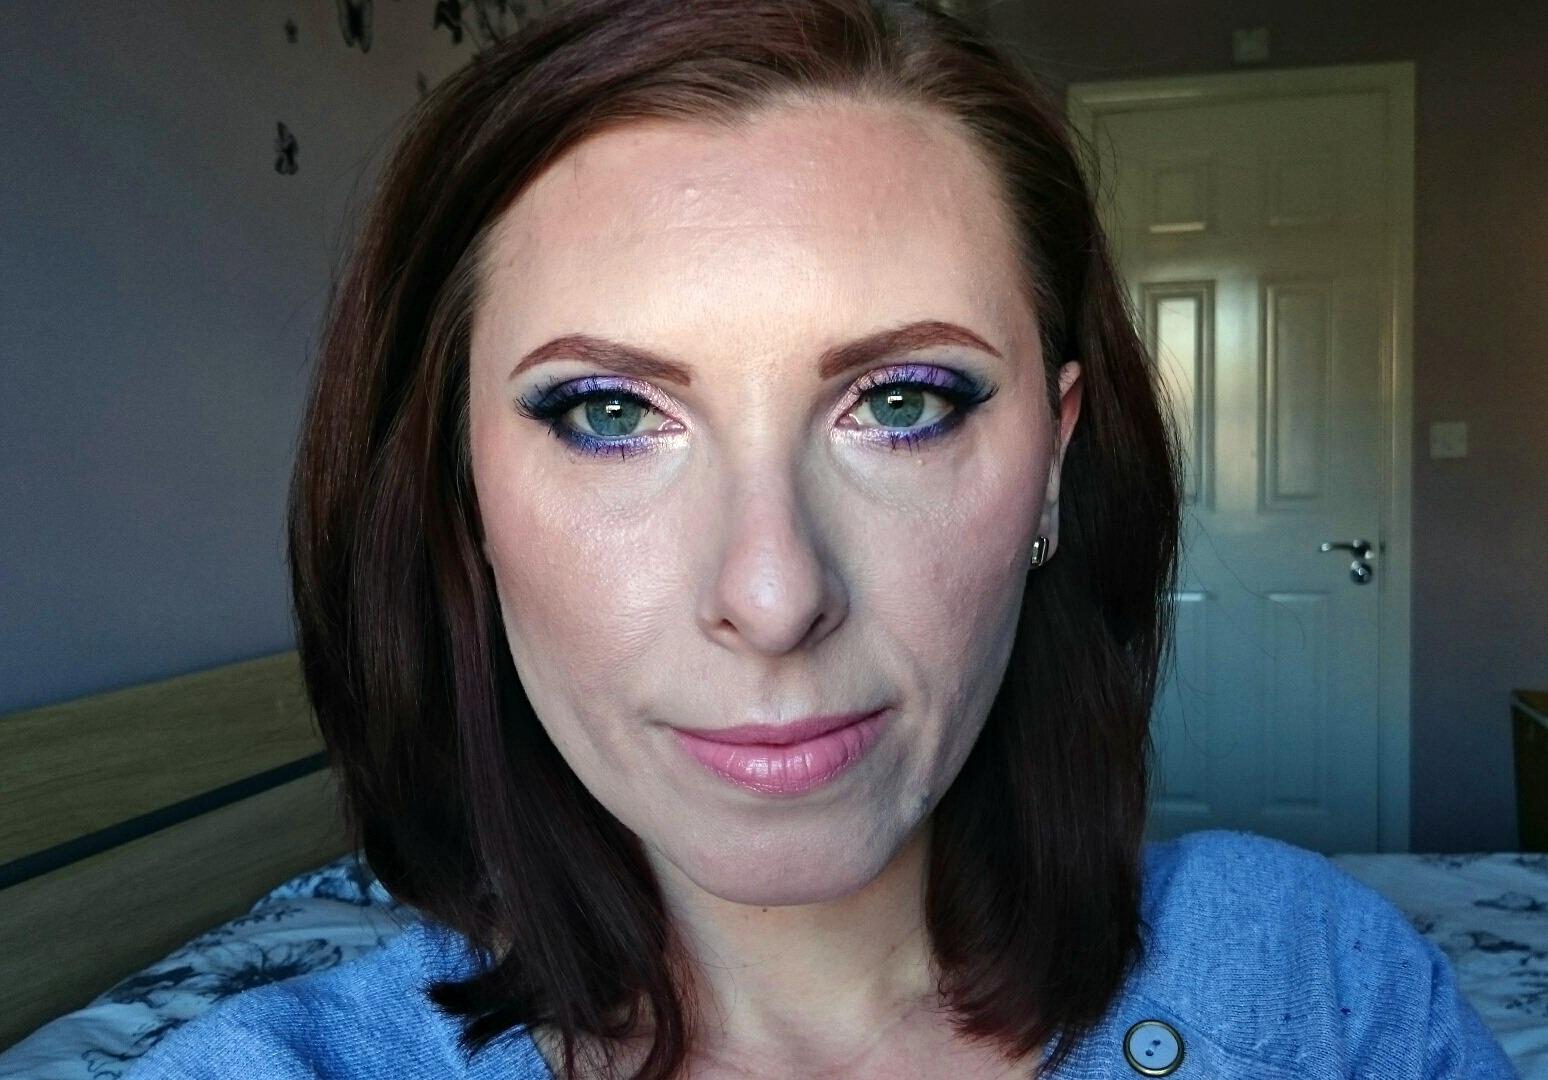 Zoeva Retro Future makeup look